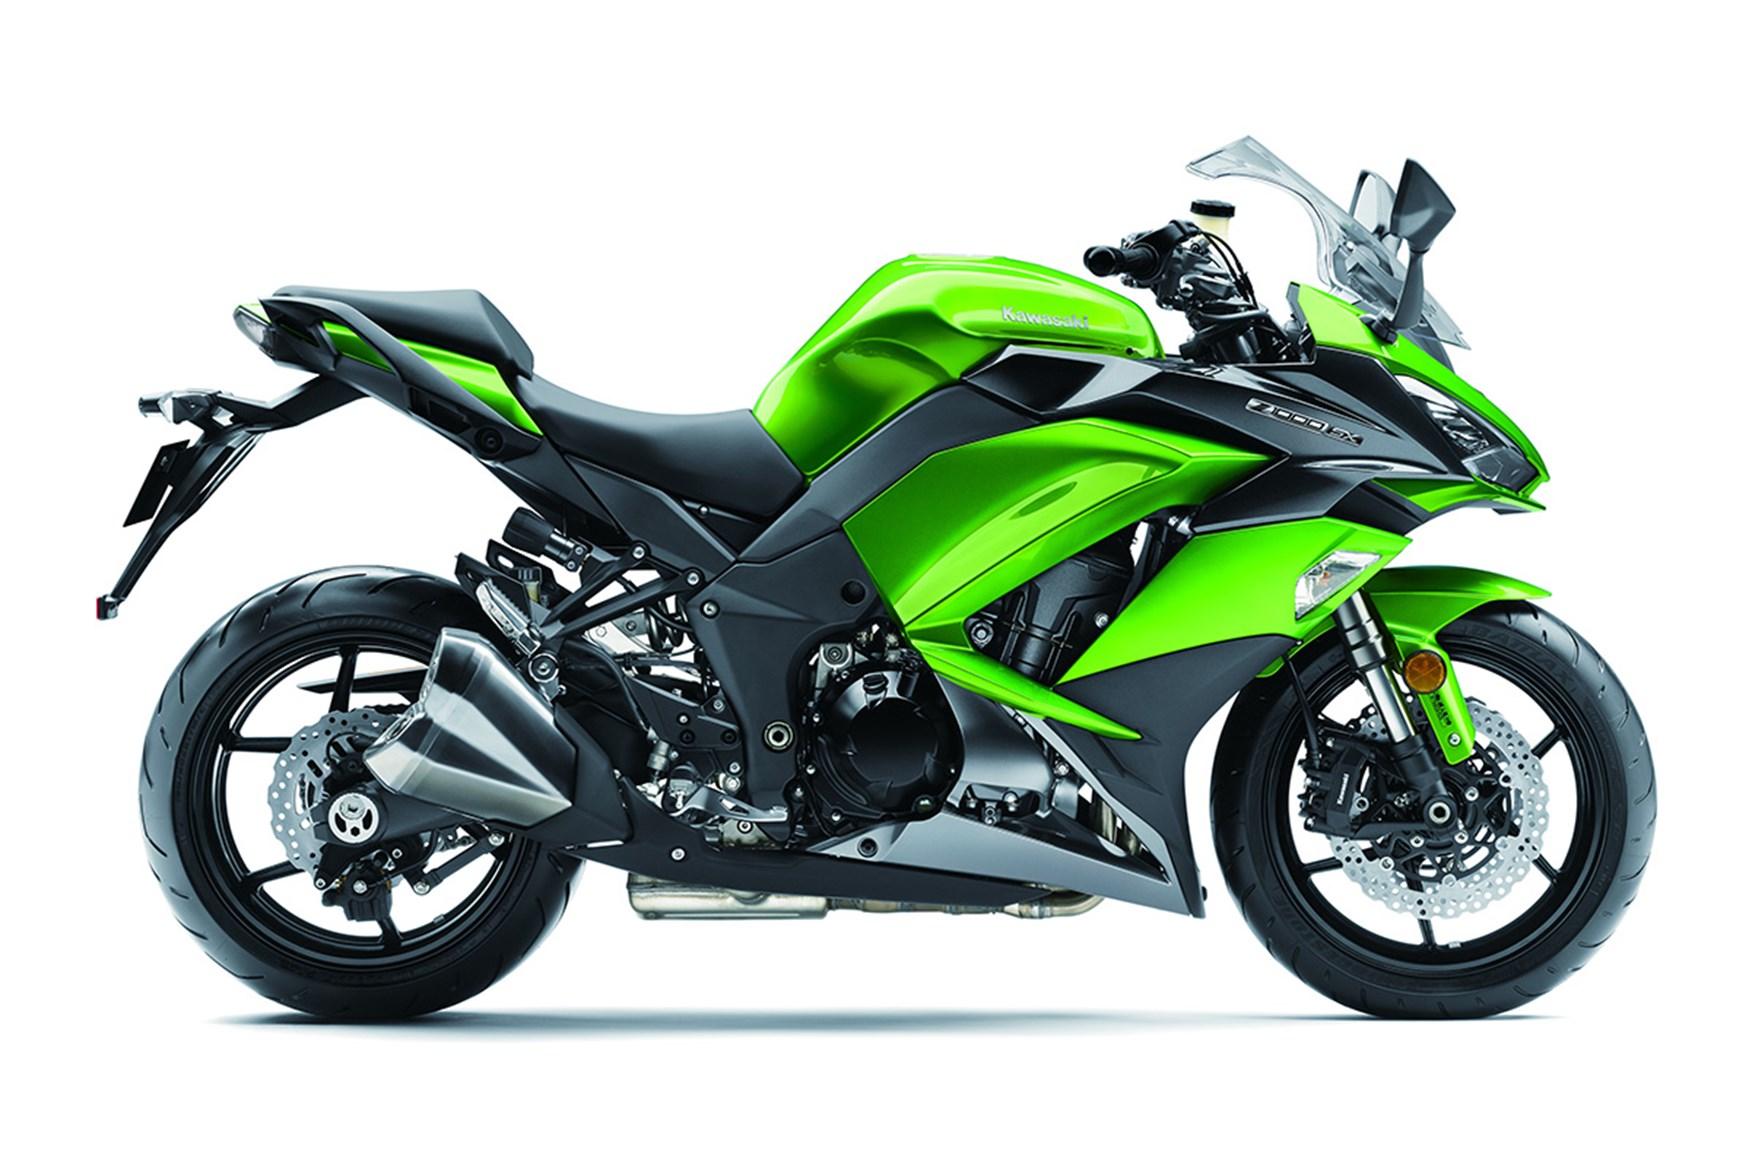 2018 Kawasaki Z250SL, RM15,600, New Kawasaki Motorcycles, Kawasaki Selangor   imotorbike.my